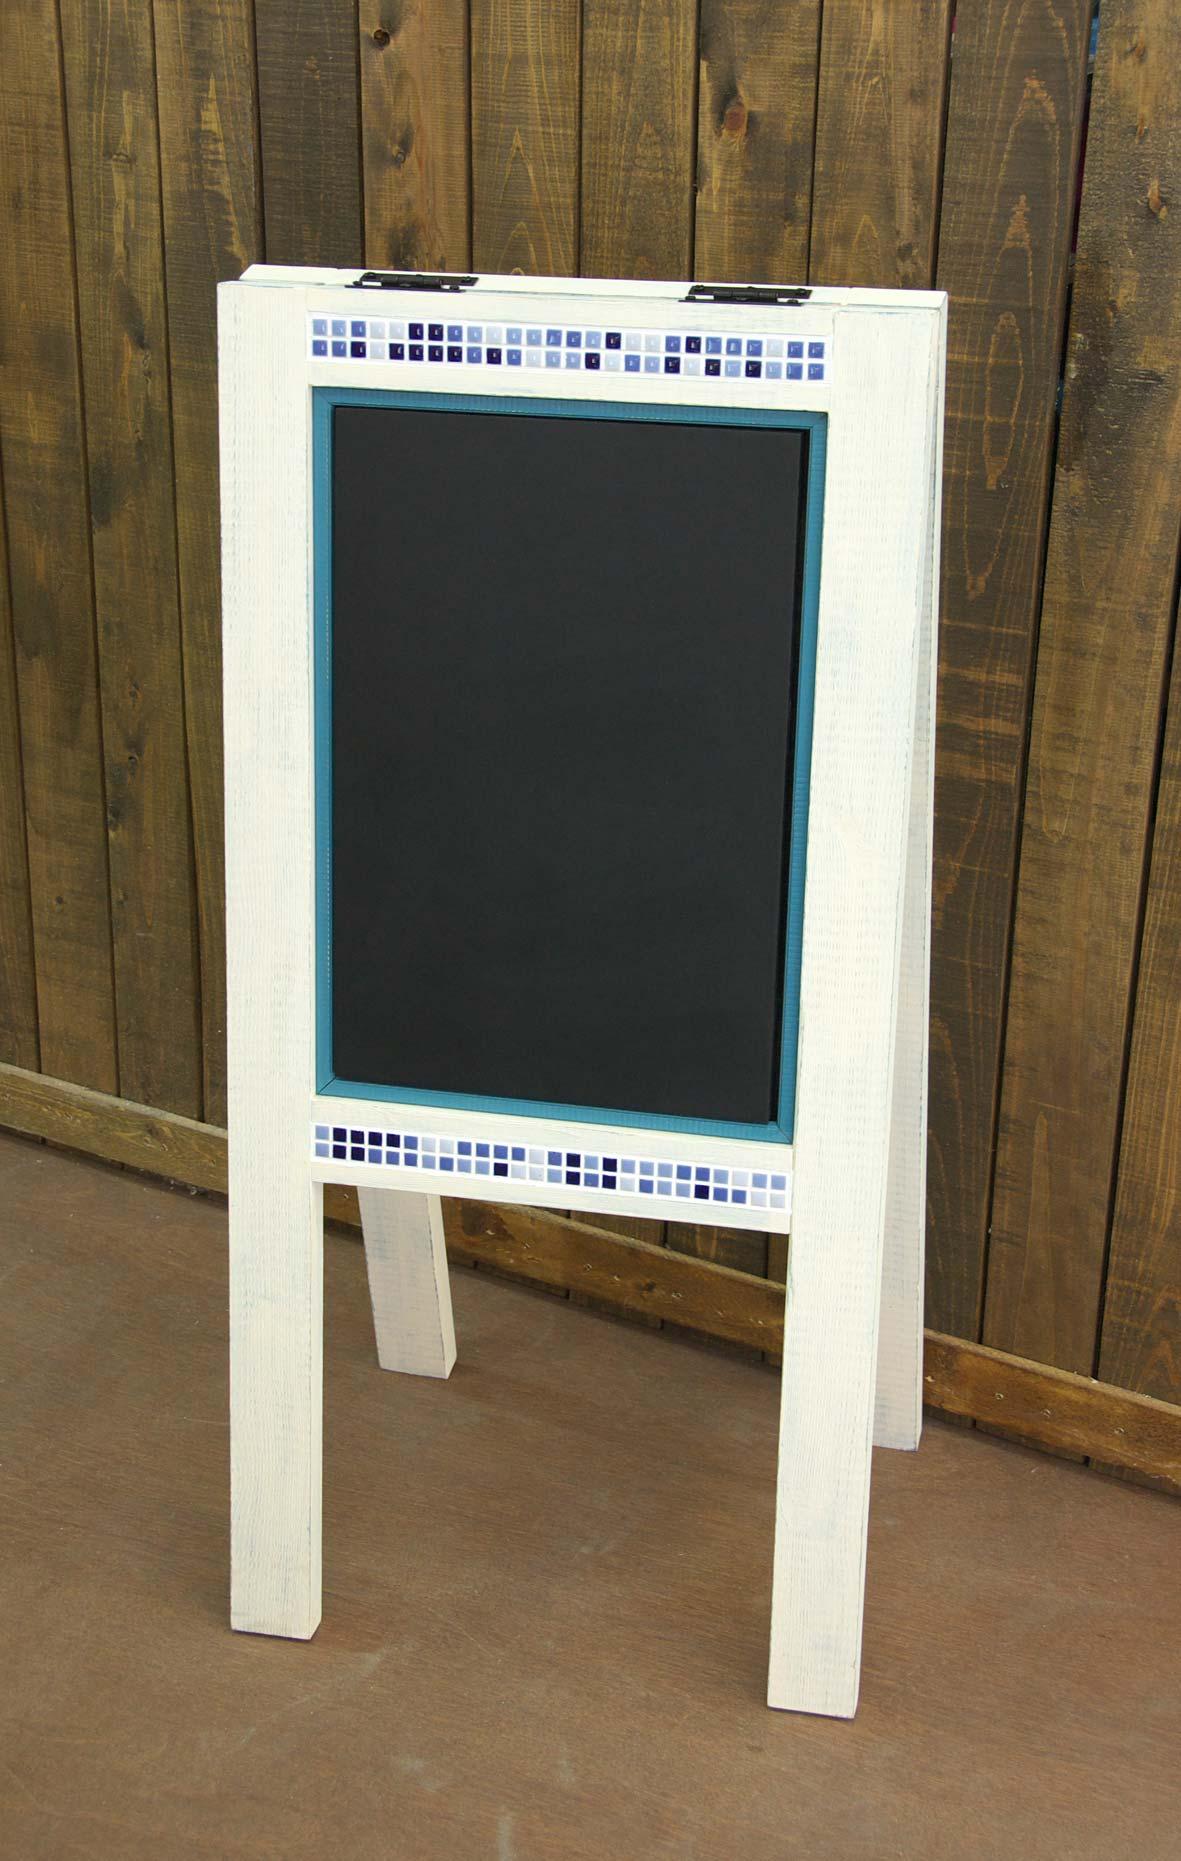 画像1: tile(黒板)-board「両面式」